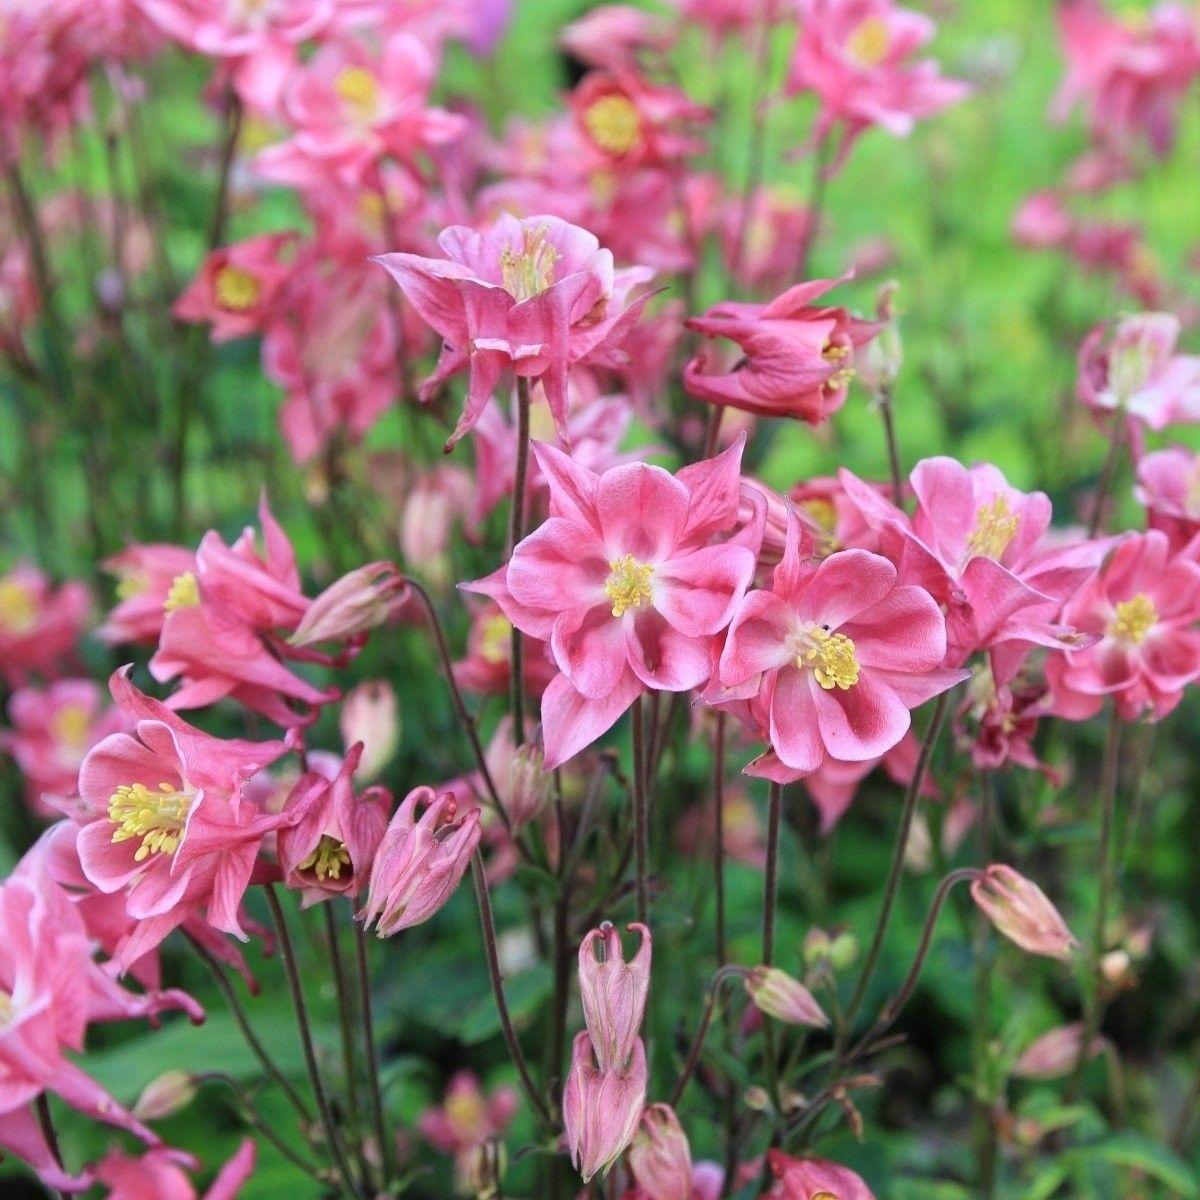 Kurzspornige Akelei Winky Rosa Rosa 3 Pflanzen Jetzt Bestellen Bei Mit Bildern Akelei Winterharte Stauden Pflanzen